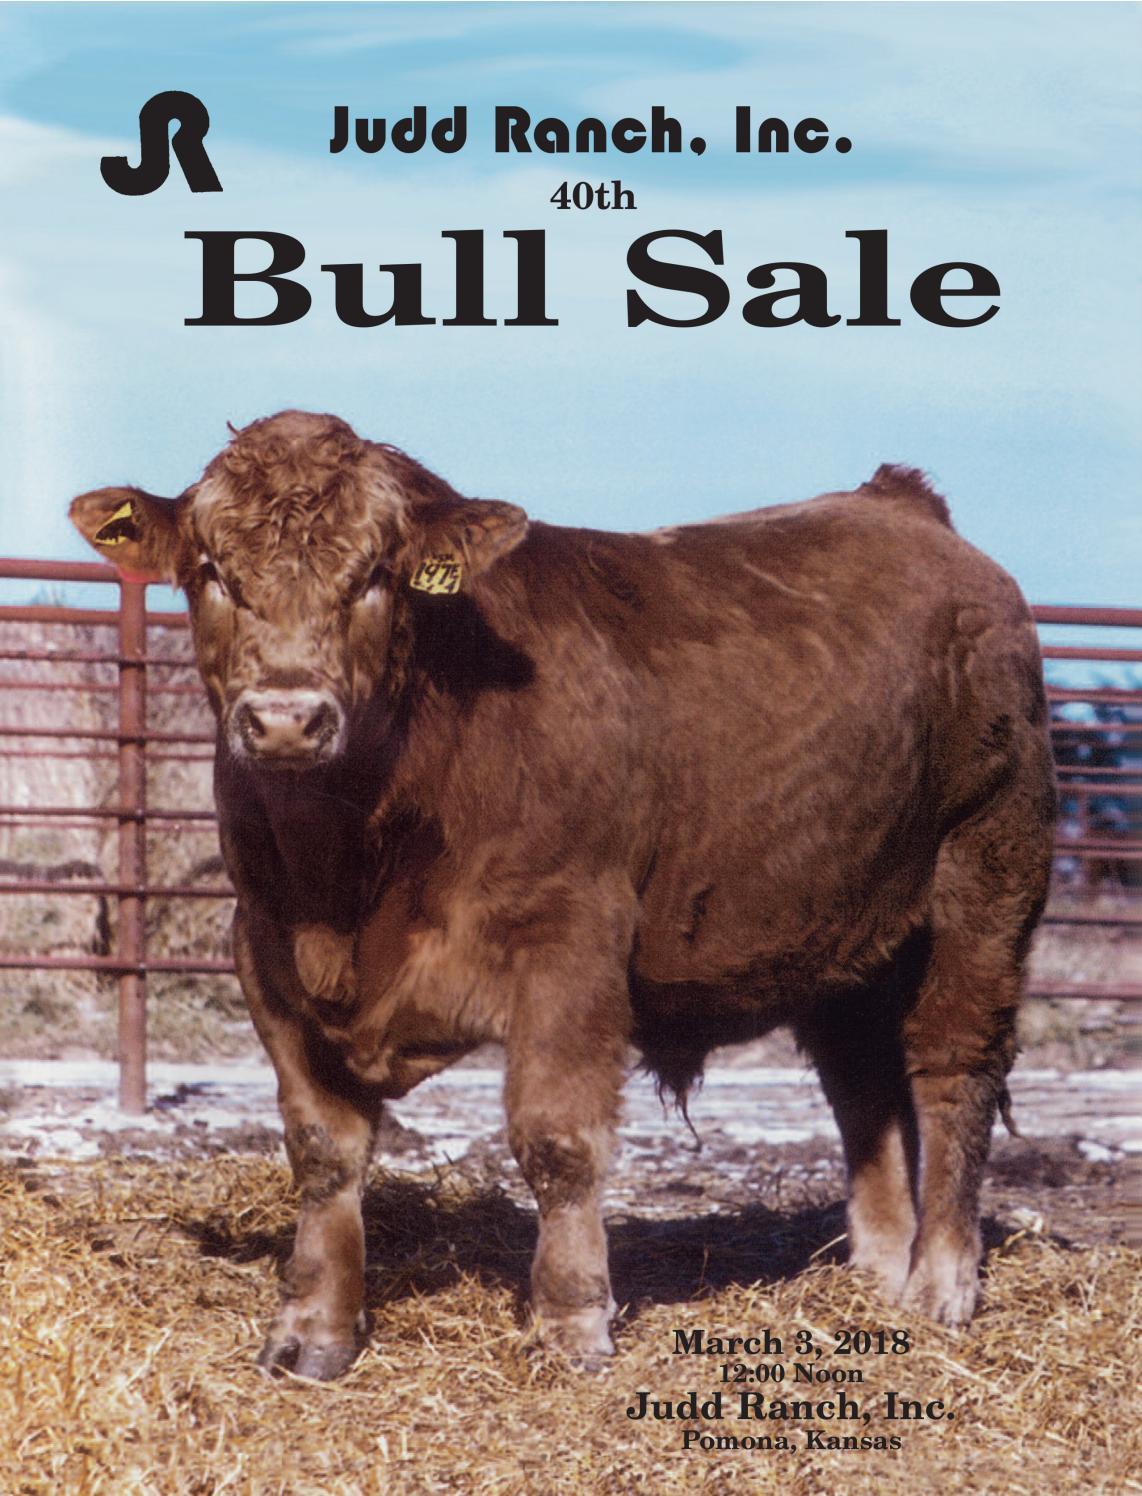 cattle bone Saddle Blank 83 x 8 x 2.4